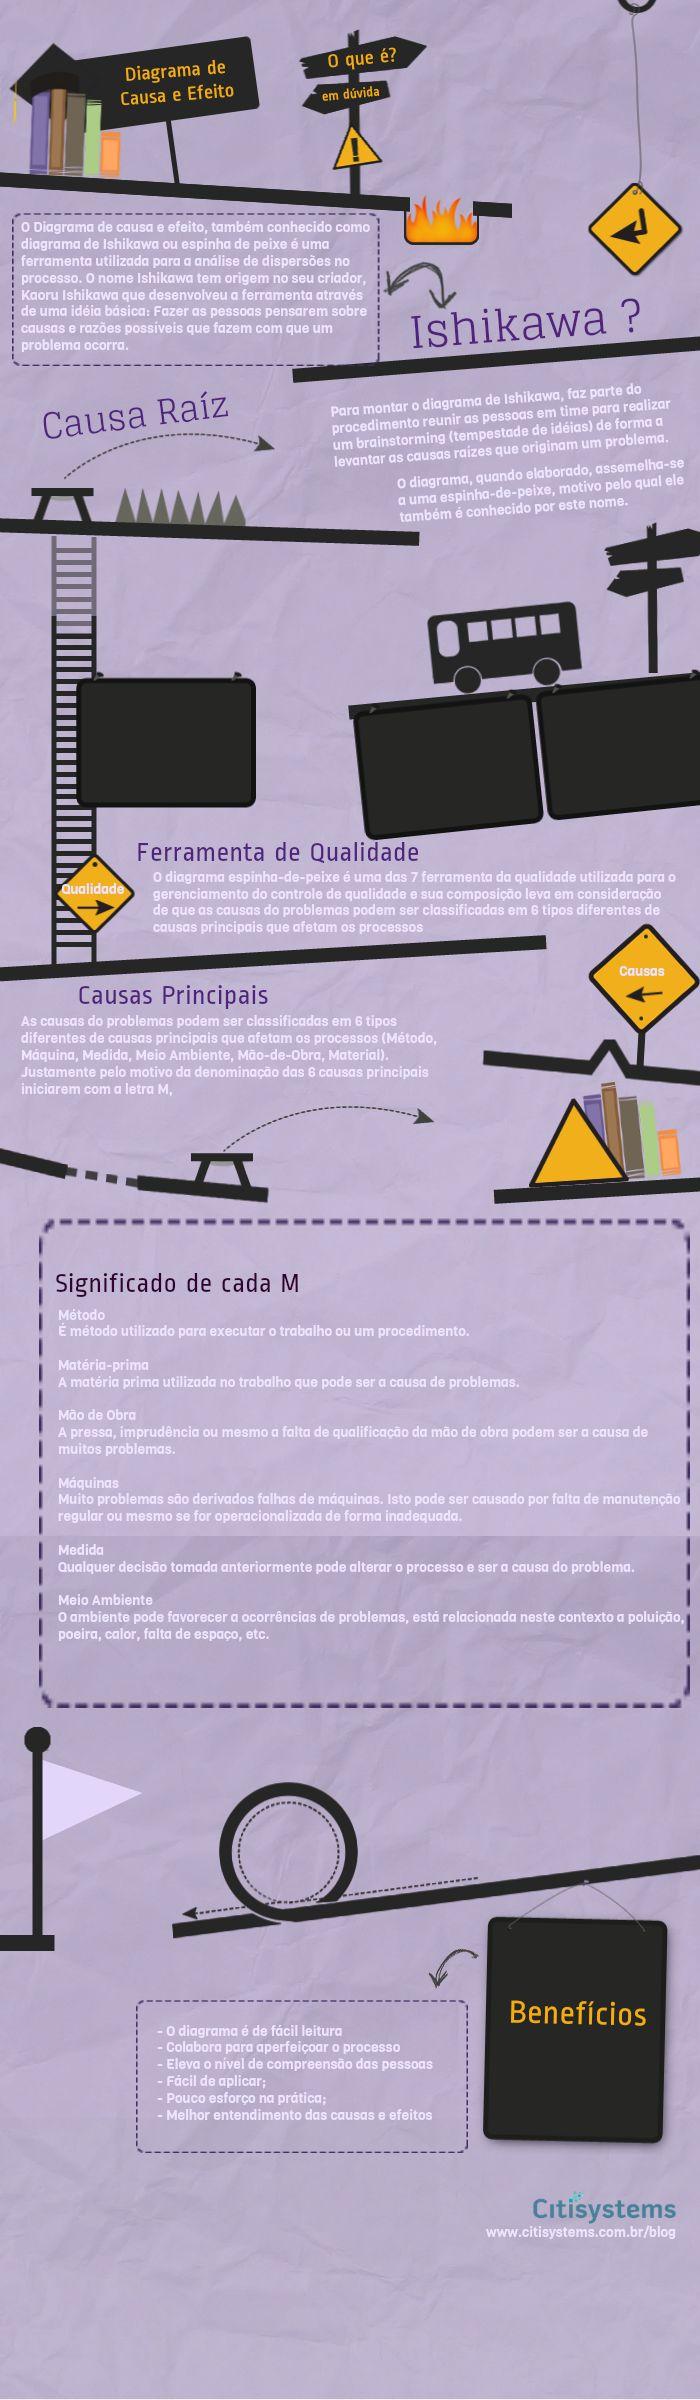 infografico-diagrama-causa-efeito infografico-diagrama-causa-efeito